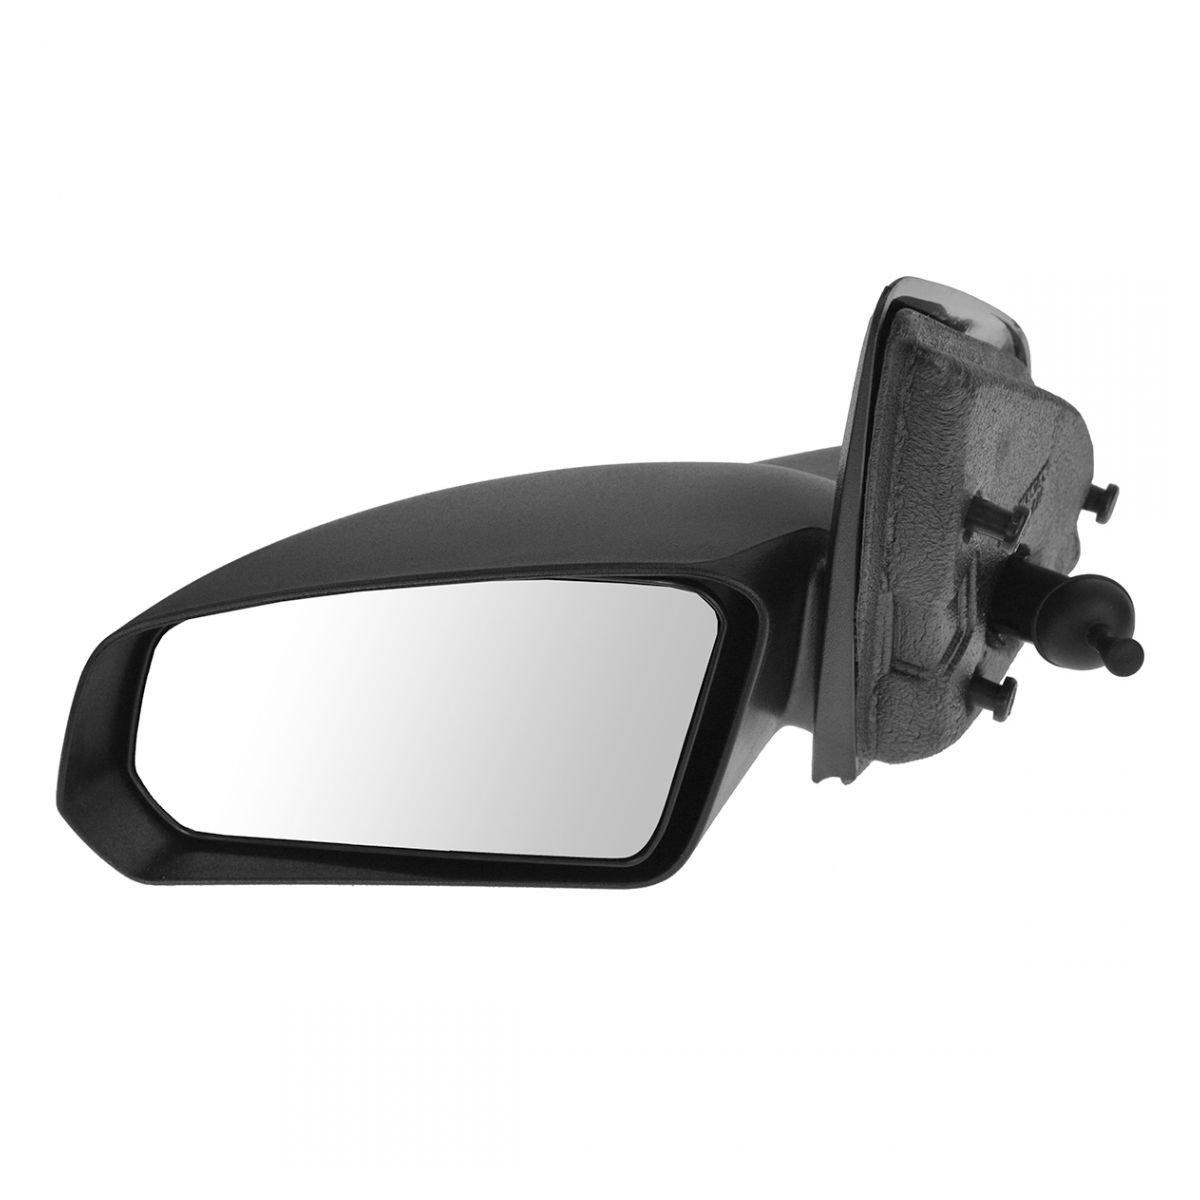 03-07 Ion 4-Door Sedan Manual Non-Folding Rear View Mirror Right Passenger Side